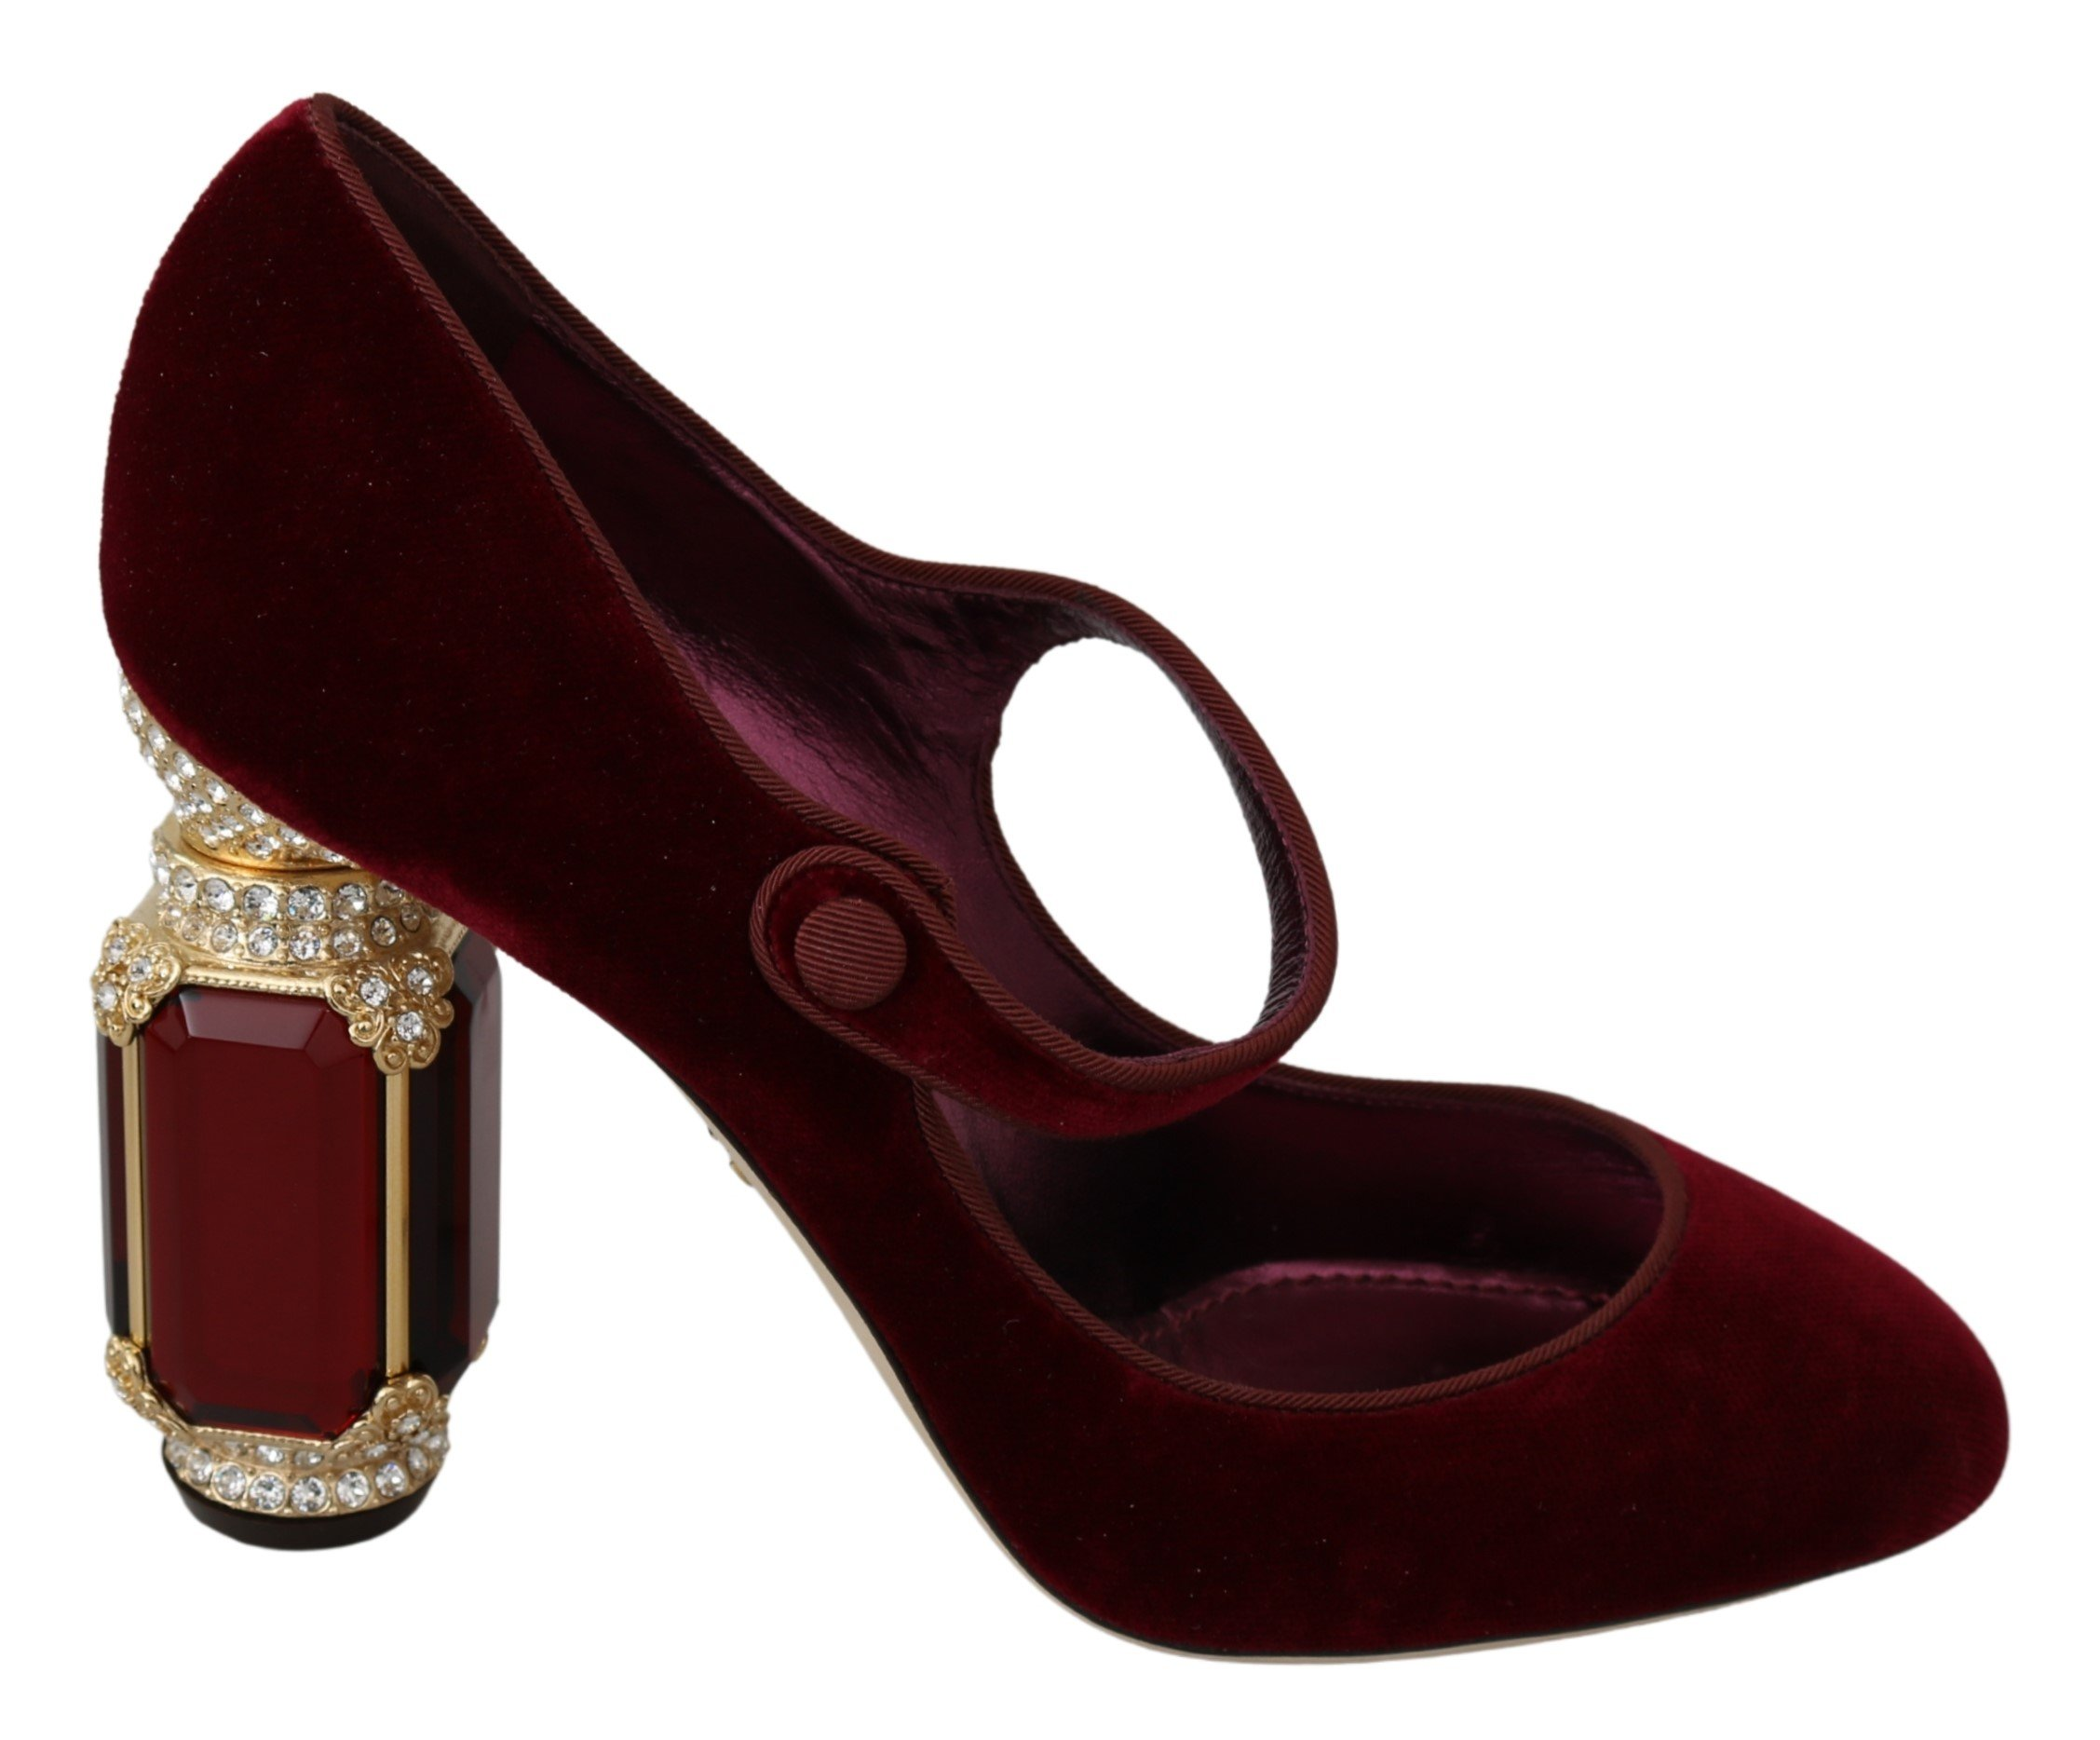 Dolce & Gabbana Women's Crystals Mary Jane Heels Red LA6851 - EU39/US8.5